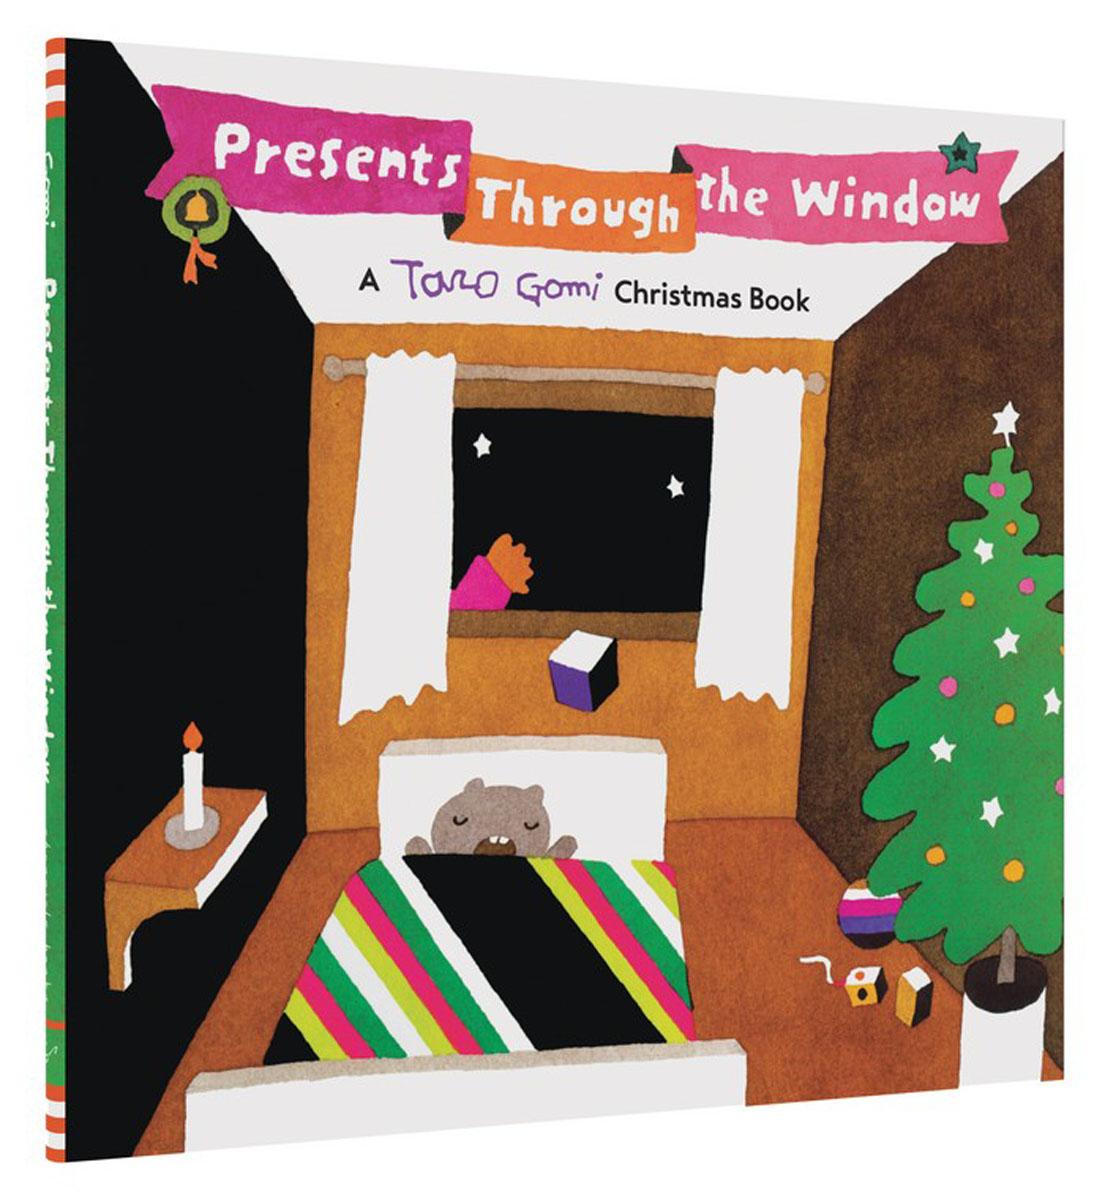 Presents Through the Window cheer